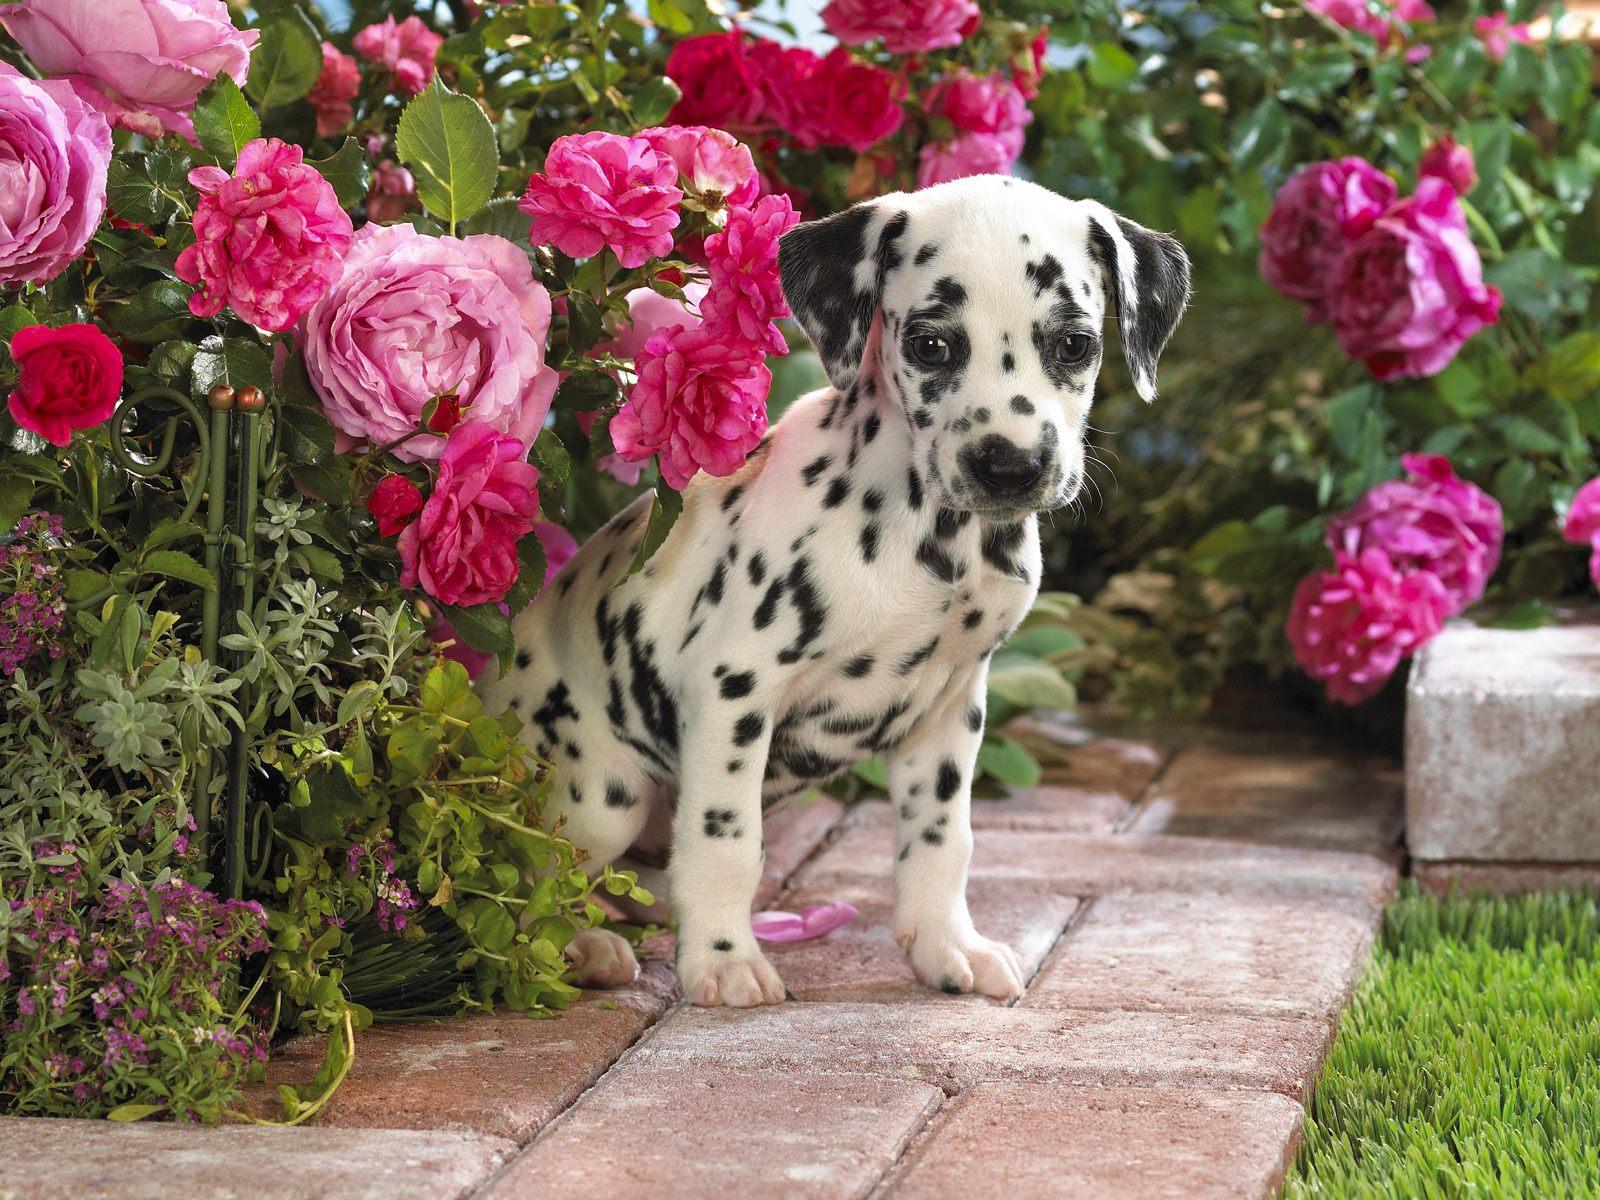 Dalmatian Puppies: Dalmatian Cute Dalmatian Puppies S Breed